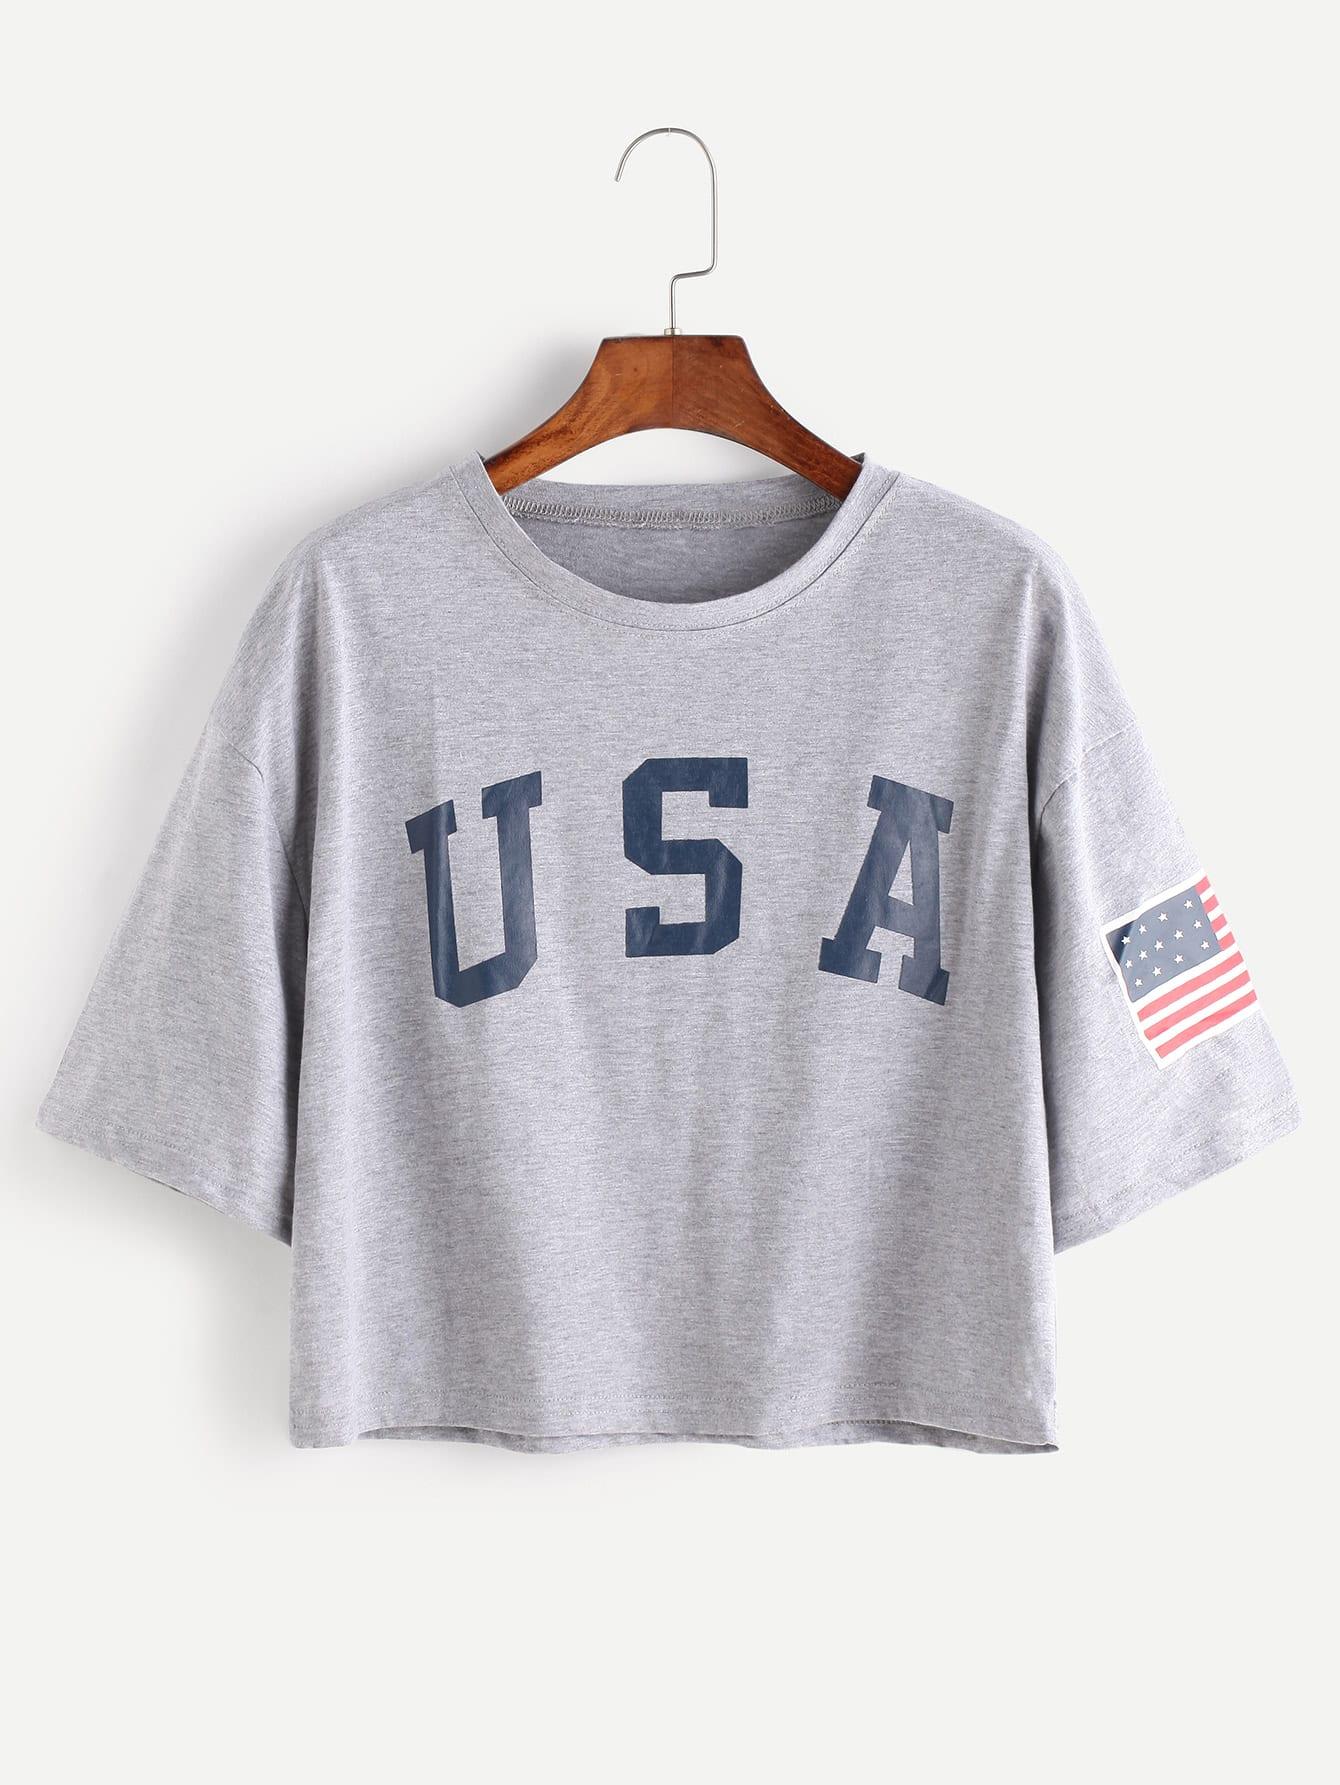 American Flag Letter Print Drop Shoulder Tee SheInSheinside